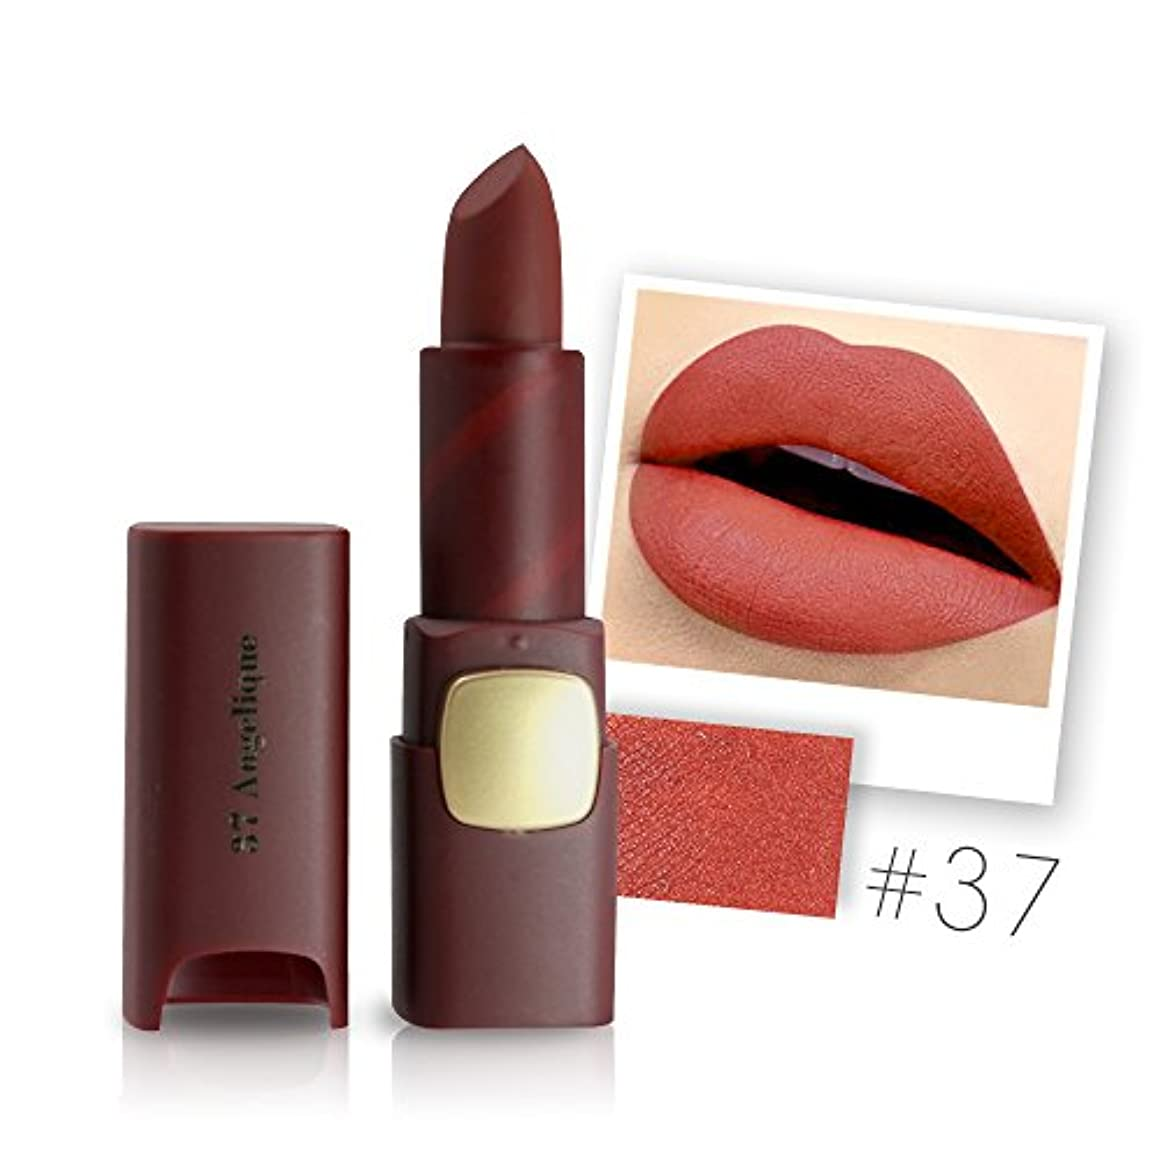 技術食料品店食料品店Miss Rose Brand Matte Lipstick Waterproof Lips Moisturizing Easy To Wear Makeup Lip Sticks Gloss Lipsticks Cosmetic